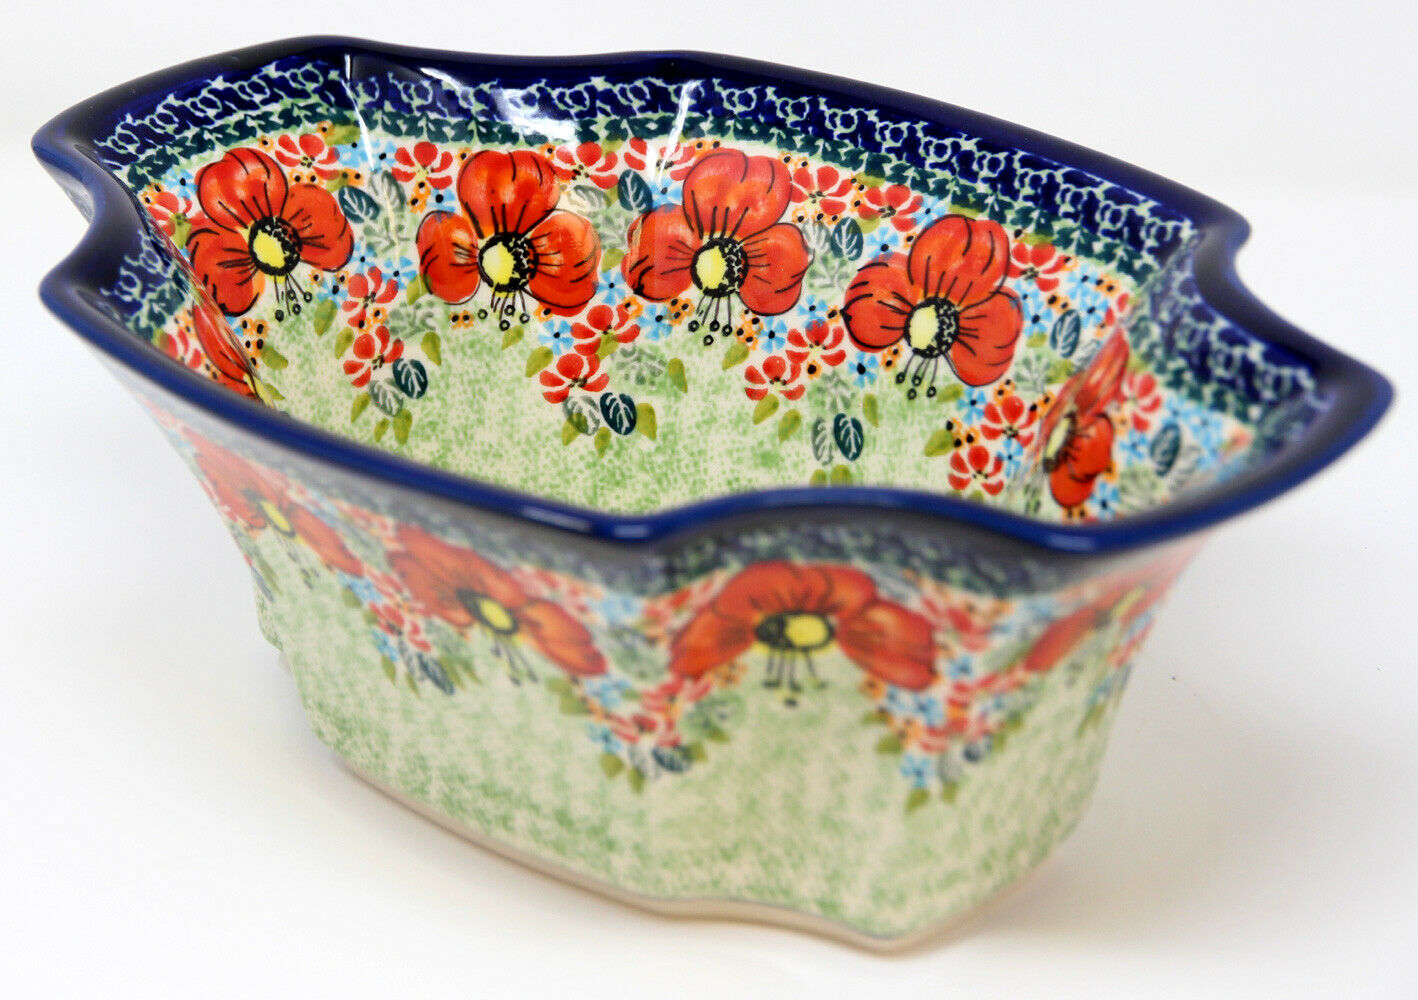 Polish Pottery Market Fruit Bowl 10.75  x 7.5  From Zaklady Boleslawiec 1203 296